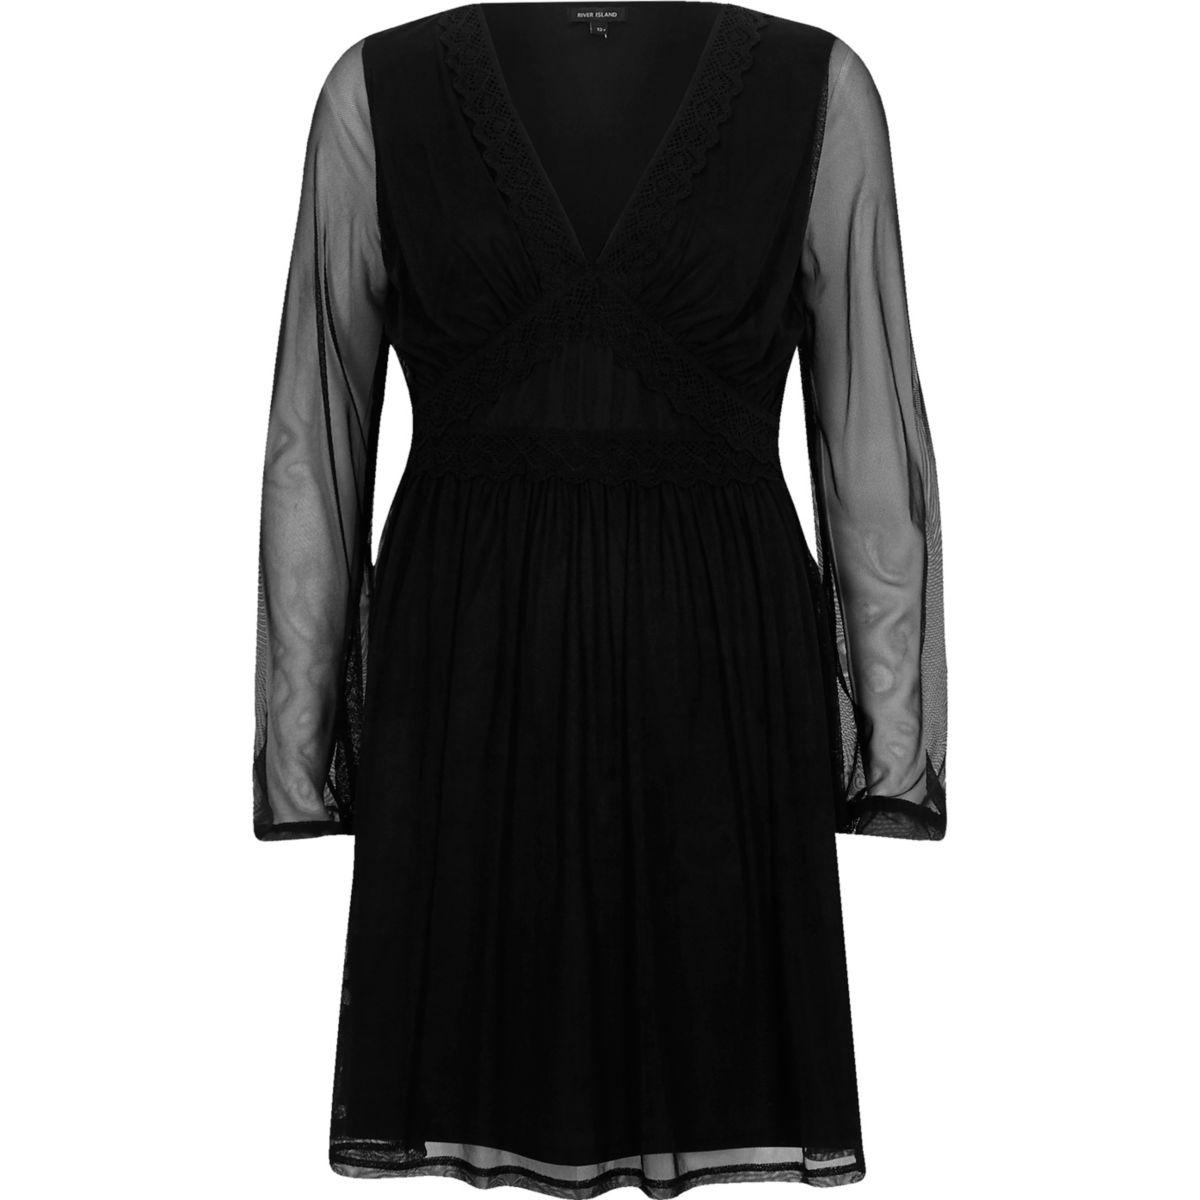 Robe noire col V avec manches en tulle